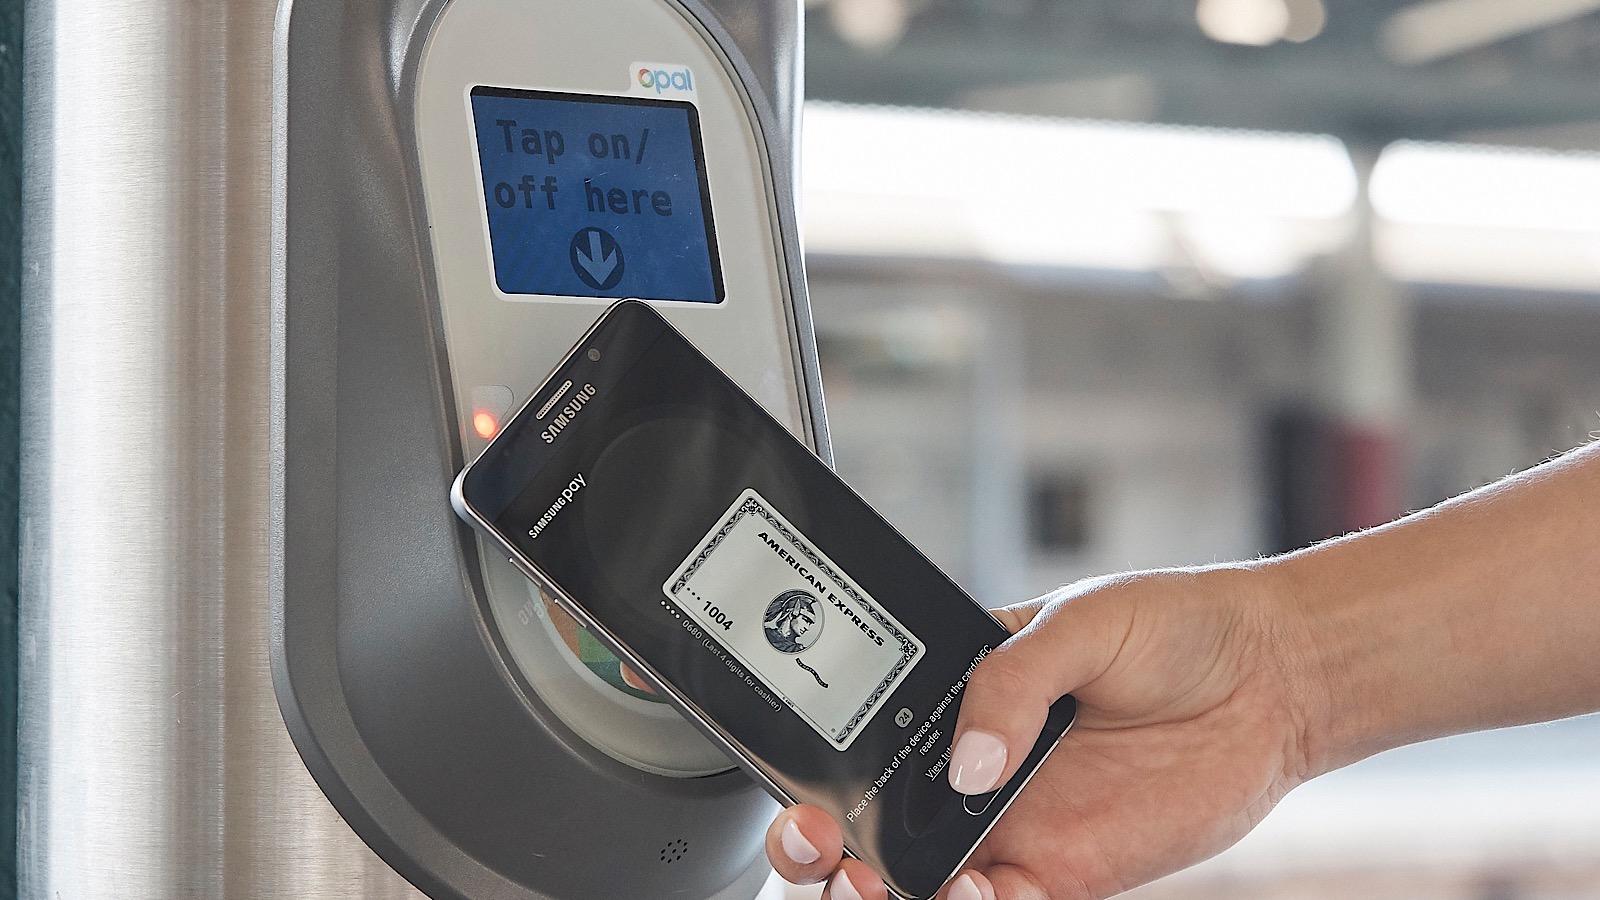 Sydney's Opal gets credit, debit tap for trains – Pickr